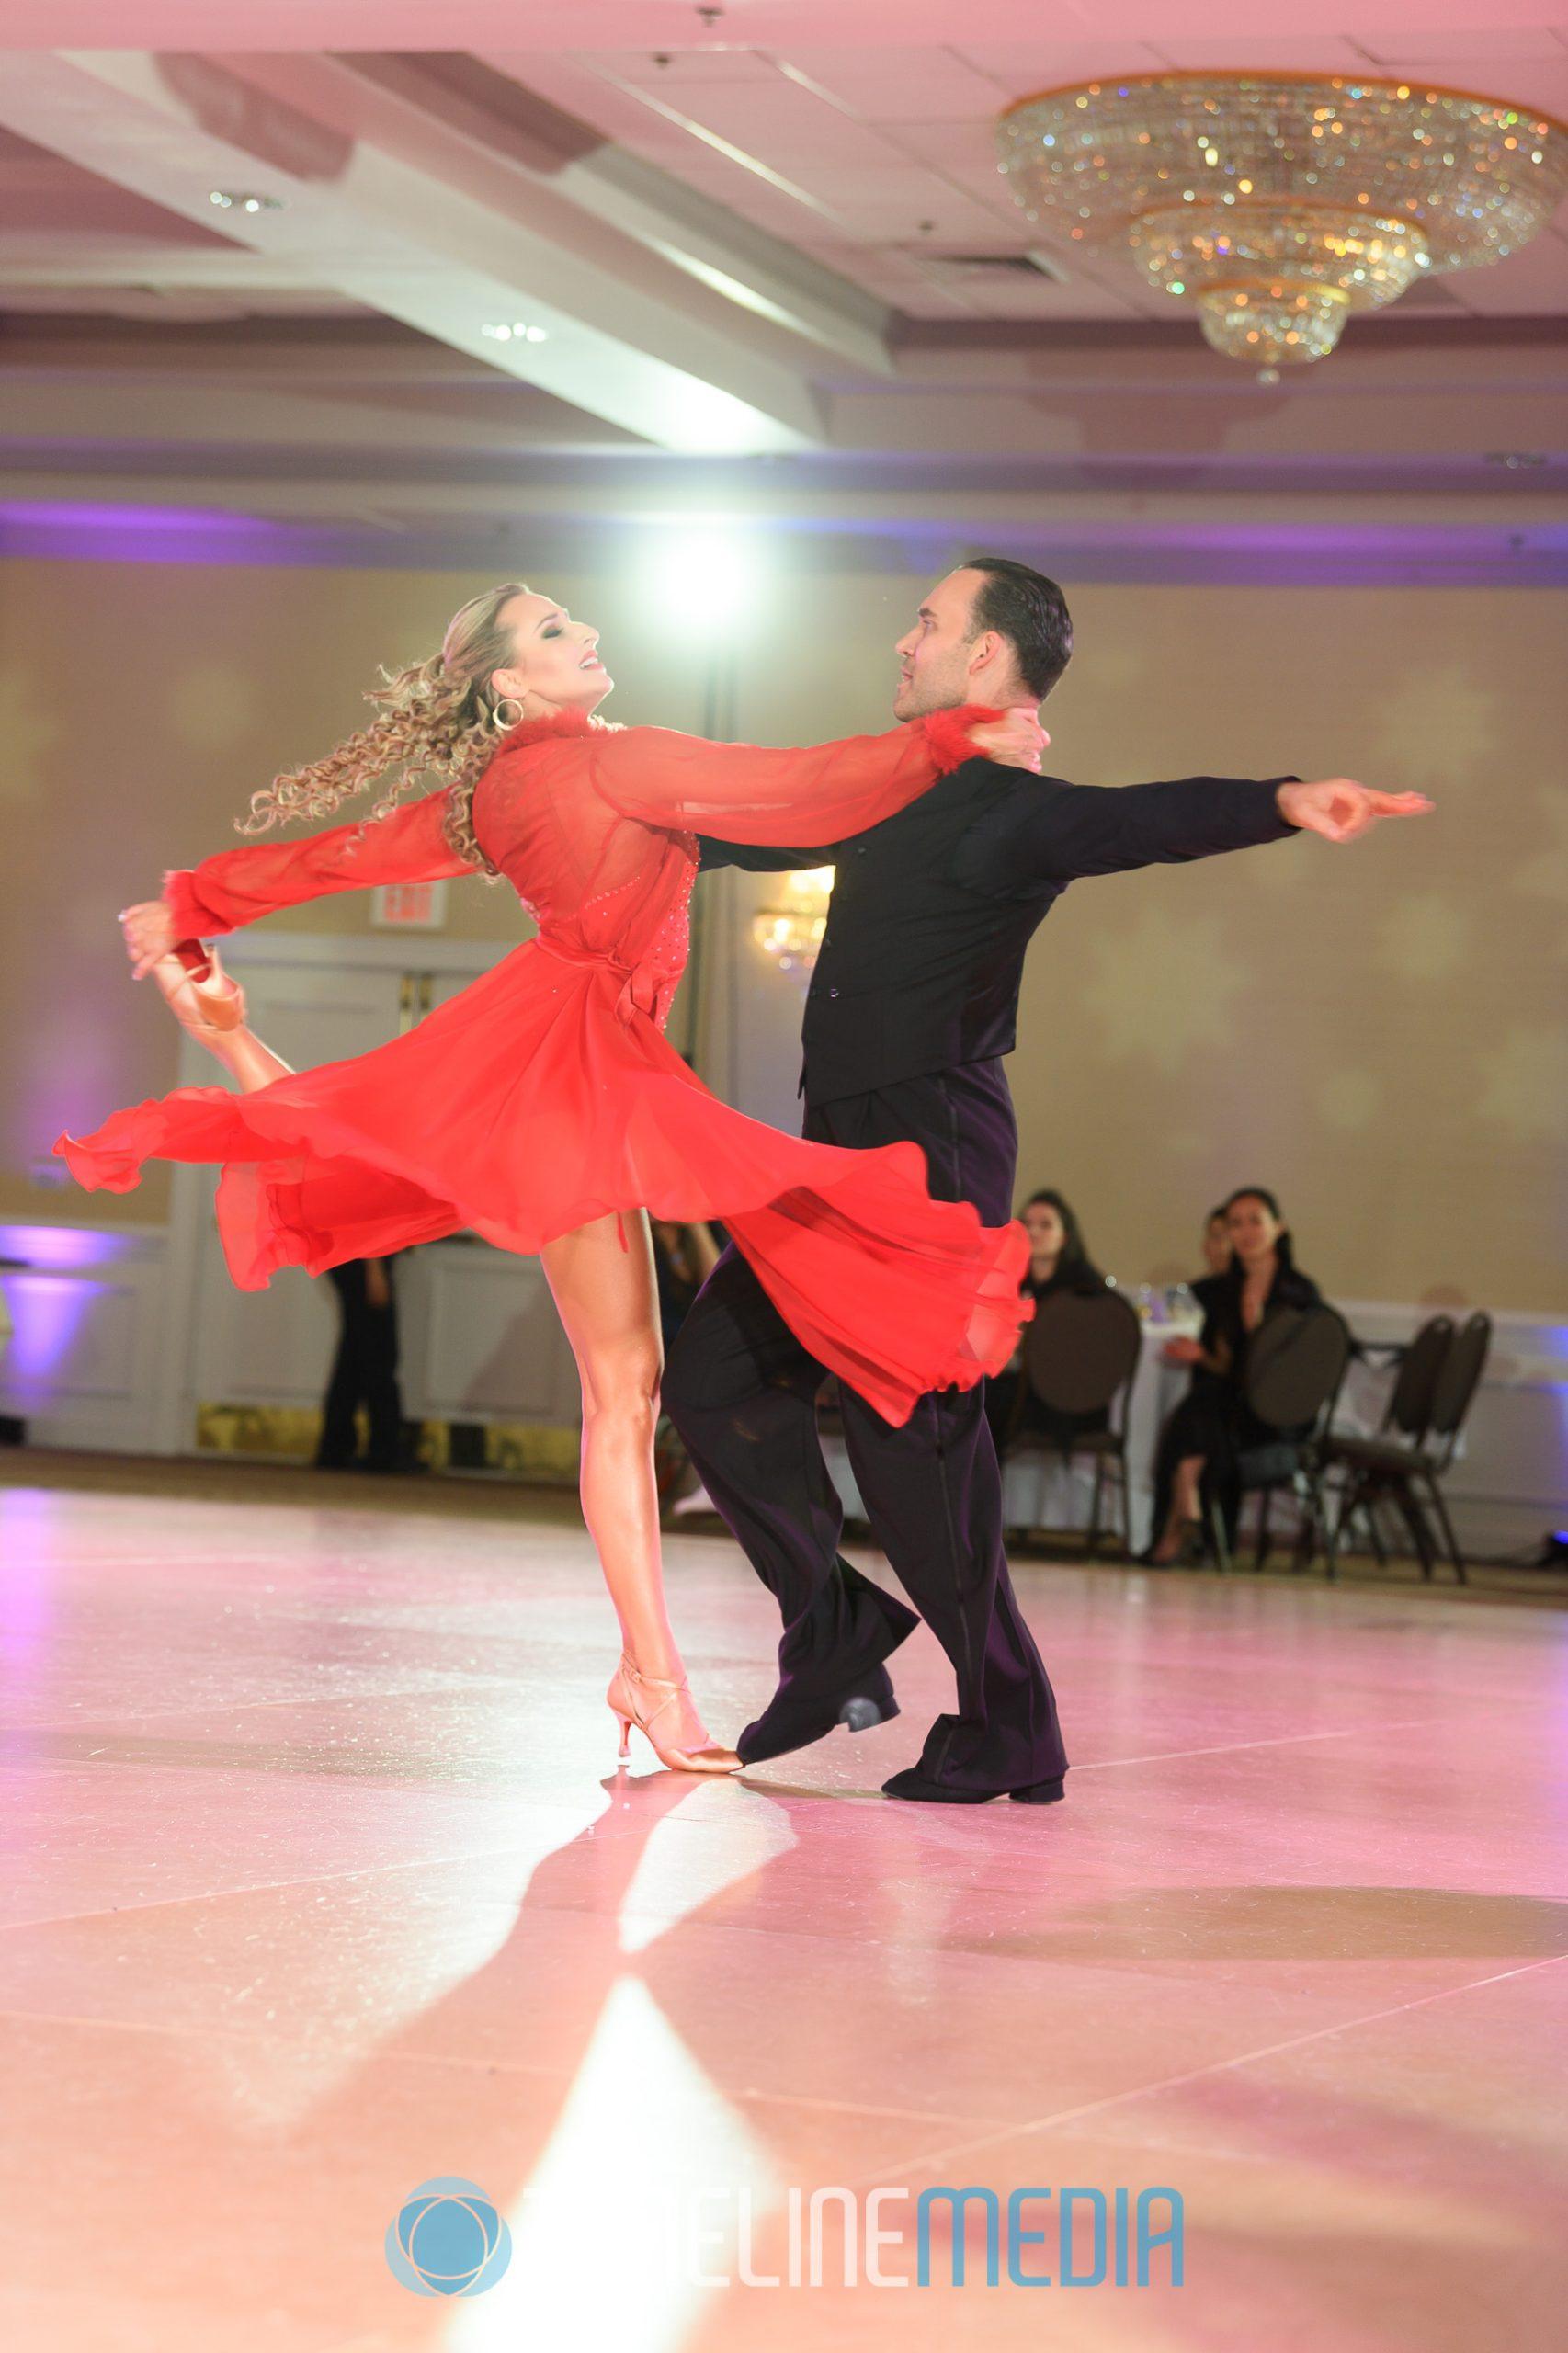 Max Sinitsa and Tatiana Seliverstova performing a professional dance show 2019 Fantasy Ball ©TimeLine Media